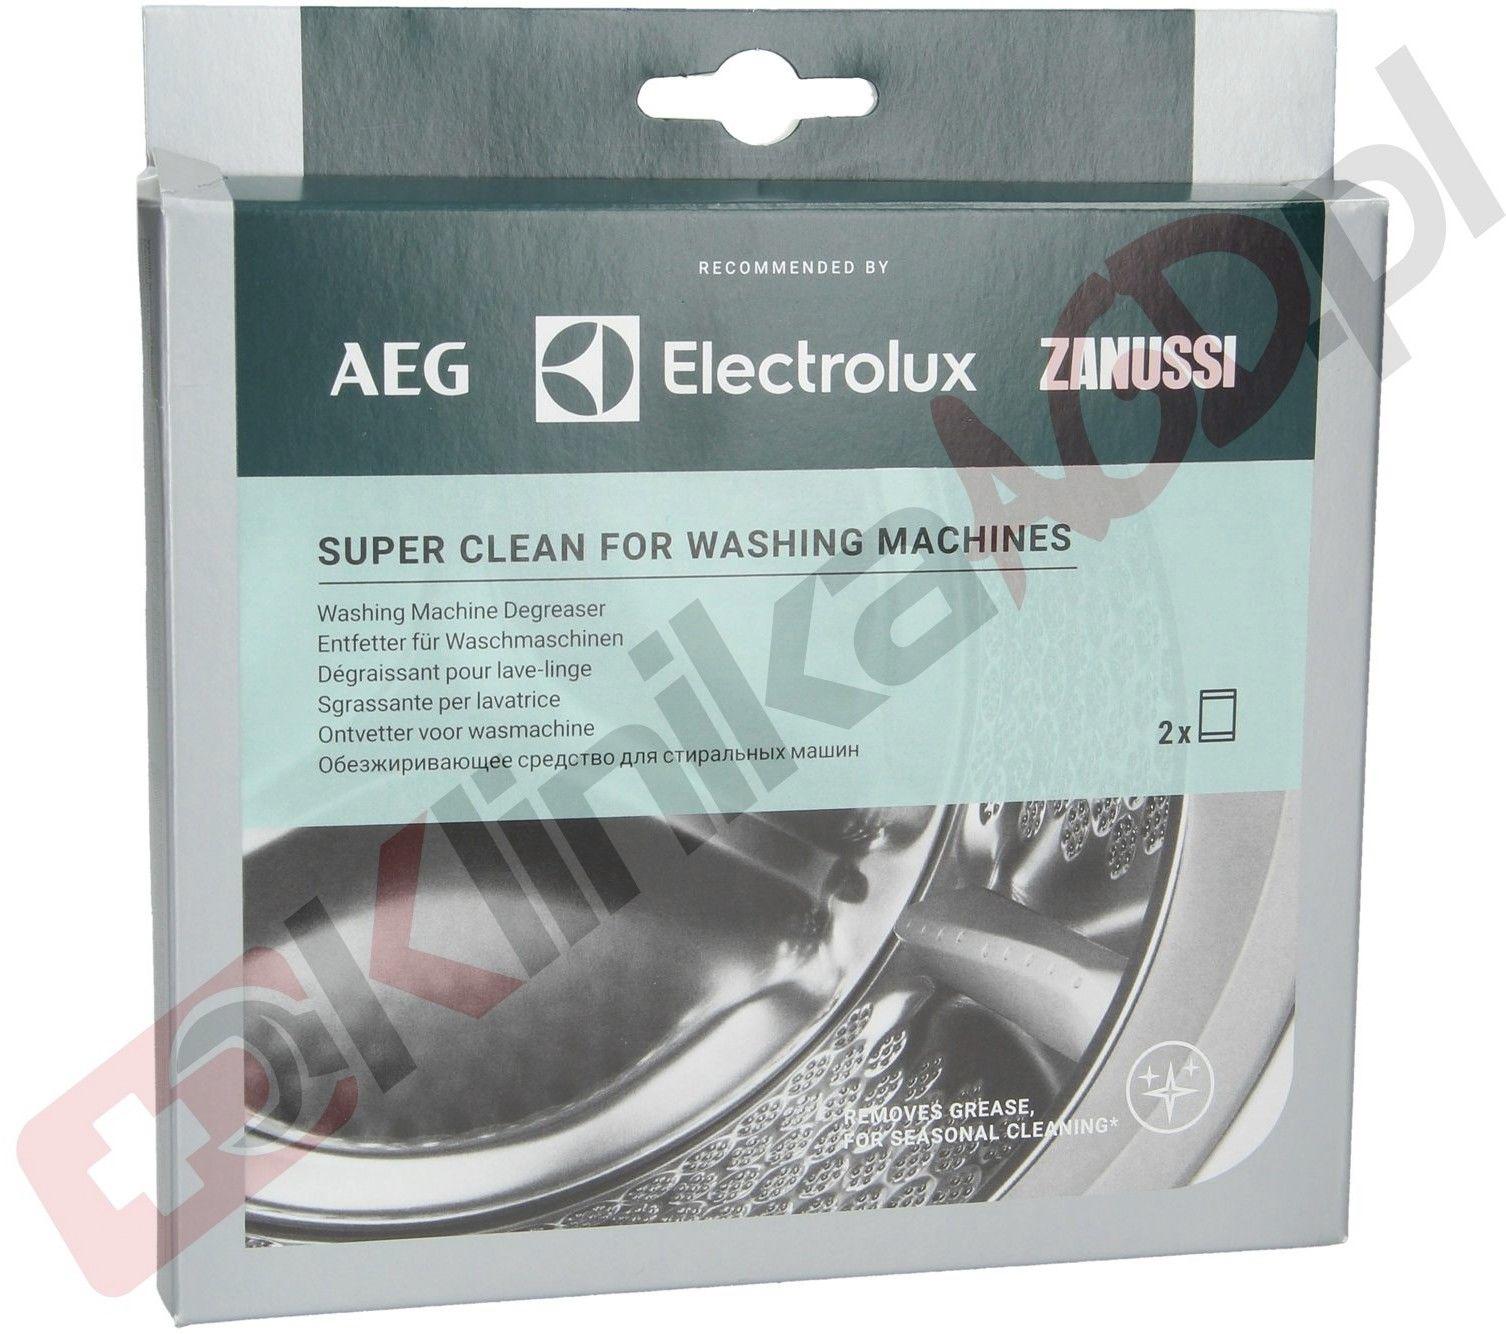 Środek czyszczący Electrolux super clean do pralki proszek 50g 2szt Schulthess